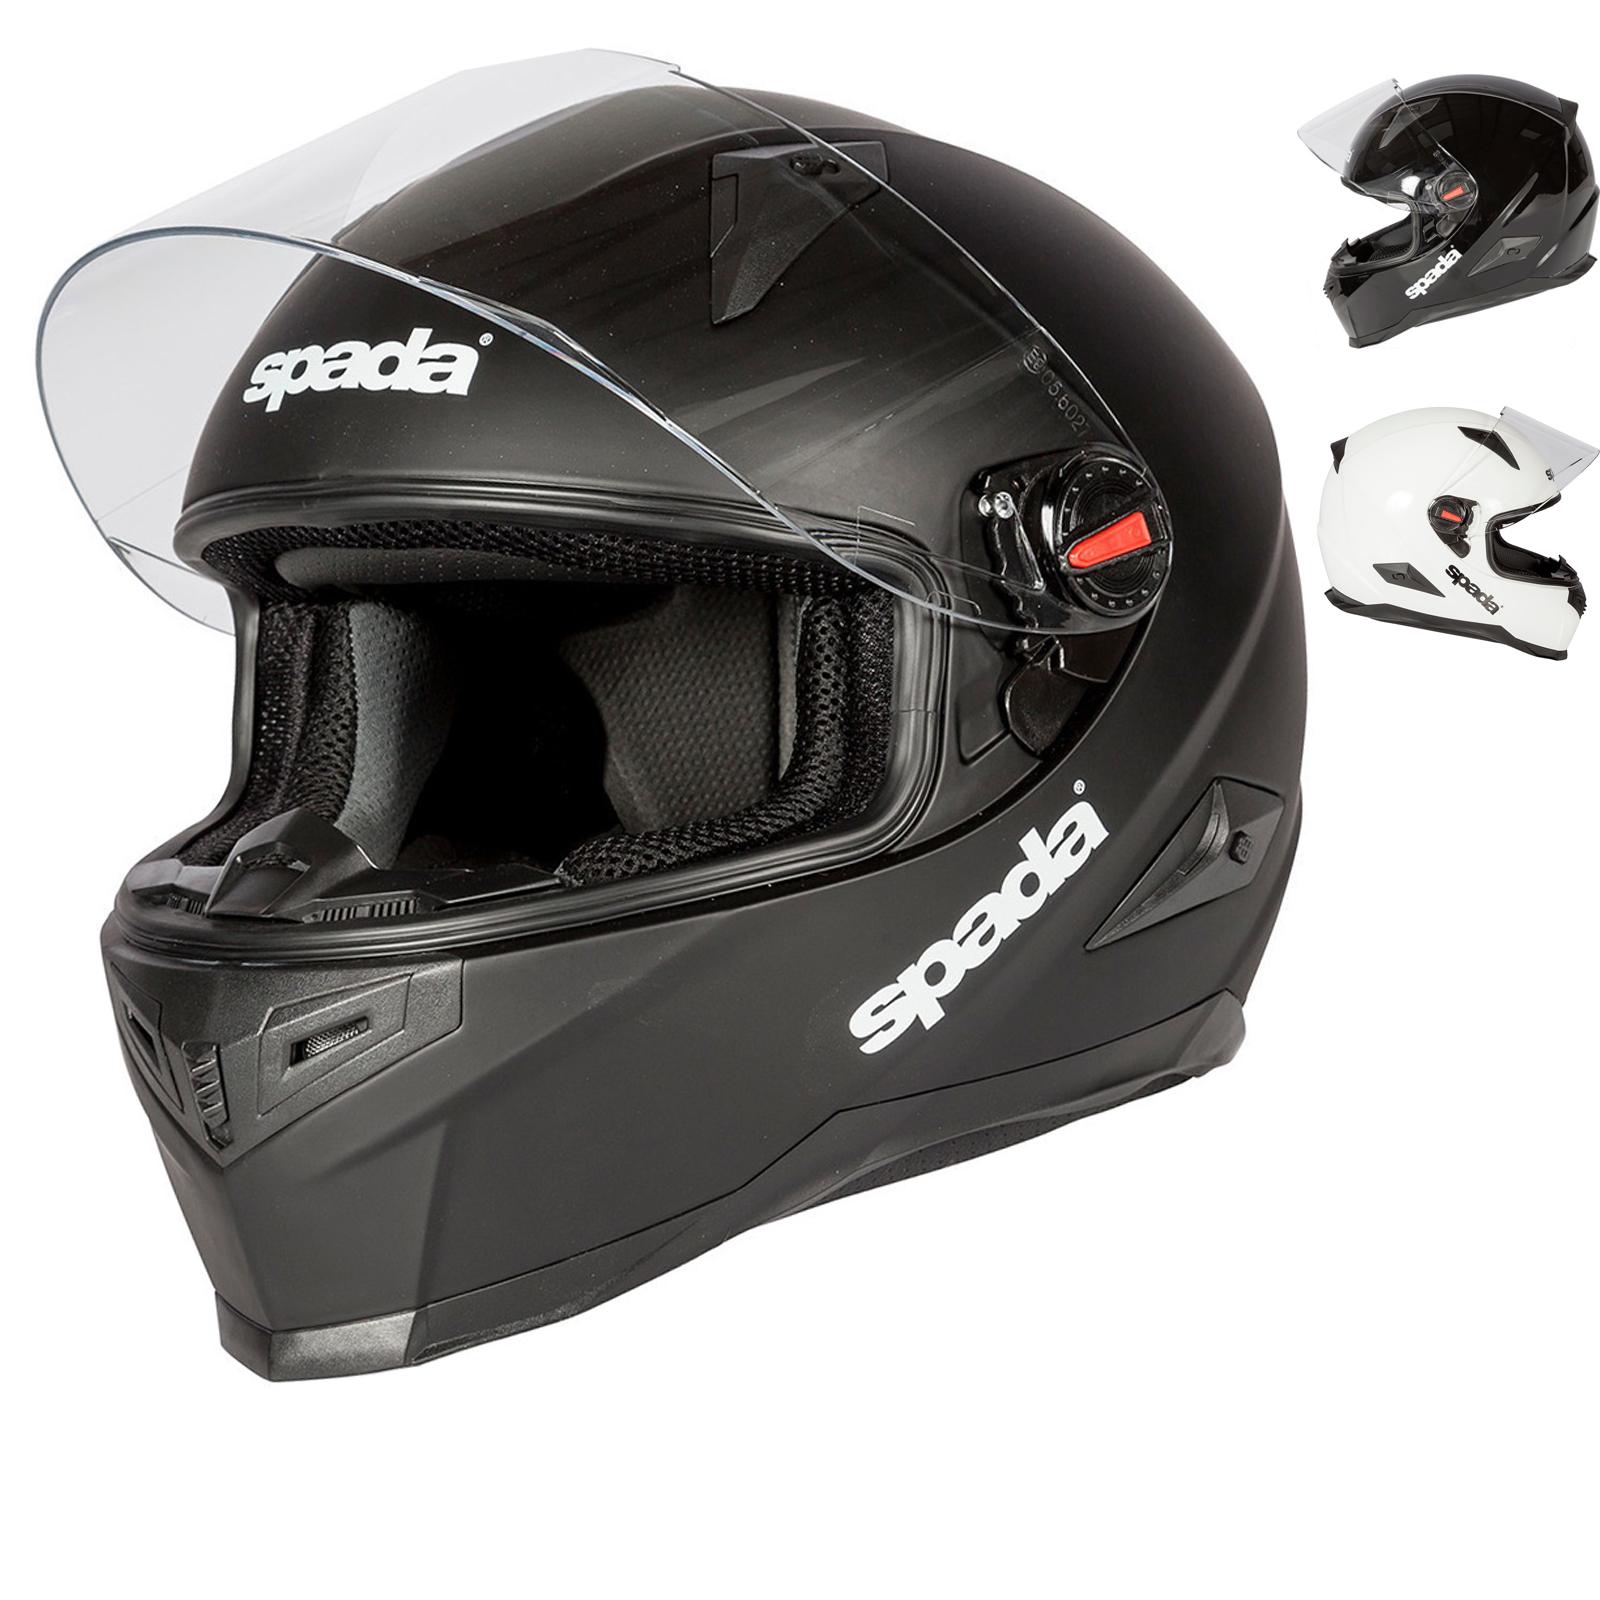 Free Spada Riding Kit